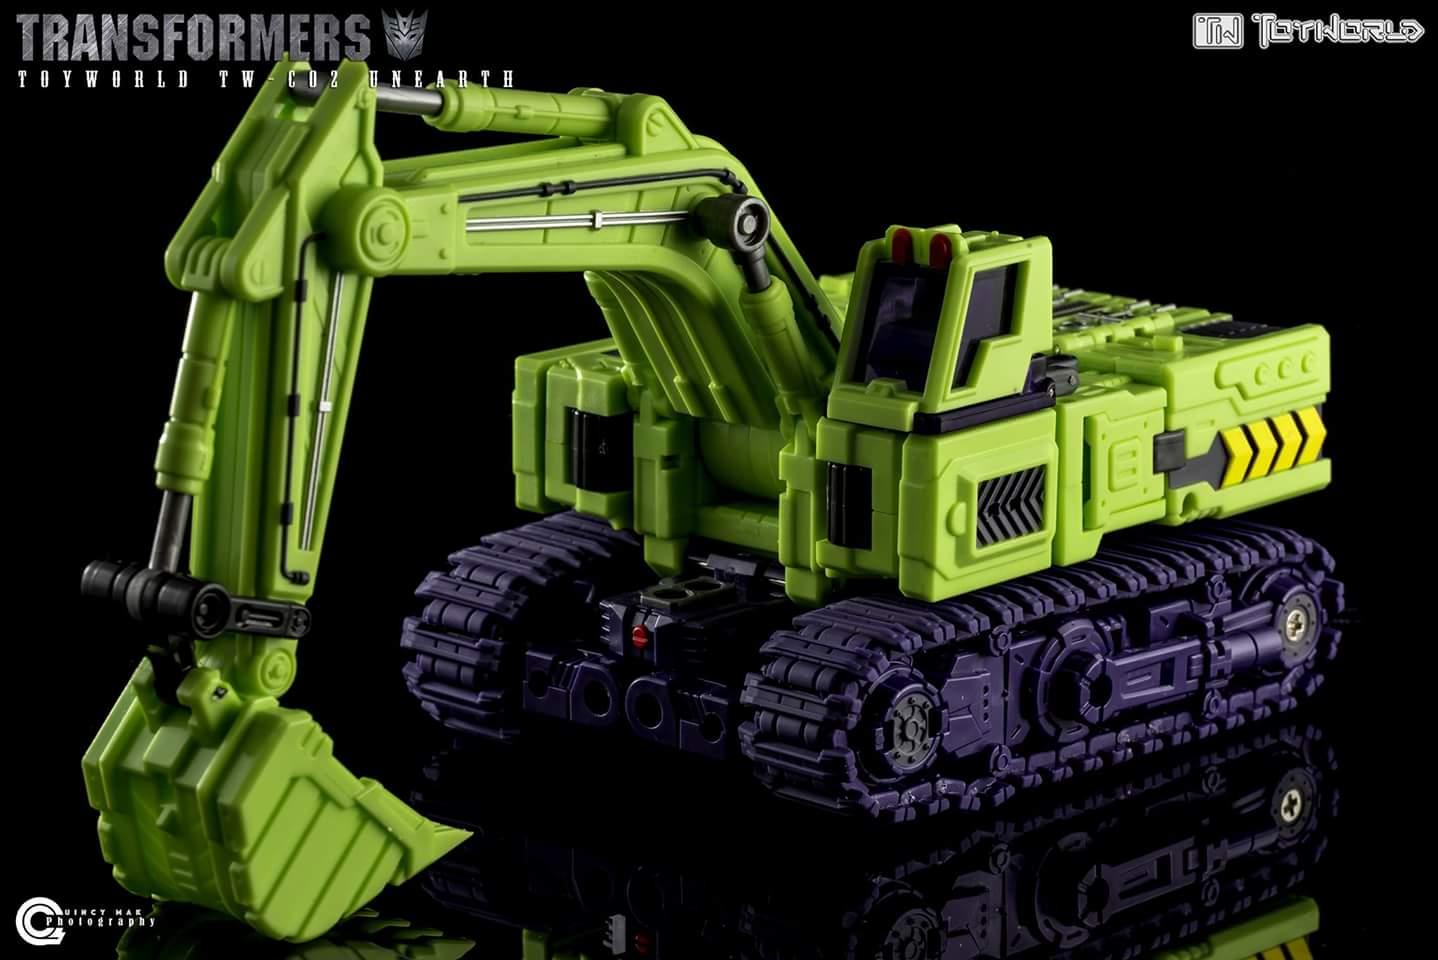 [Toyworld] Produit Tiers - Jouet TW-C Constructor aka Devastator/Dévastateur (Version vert G1 et jaune G2) - Page 3 VUKjhjKV